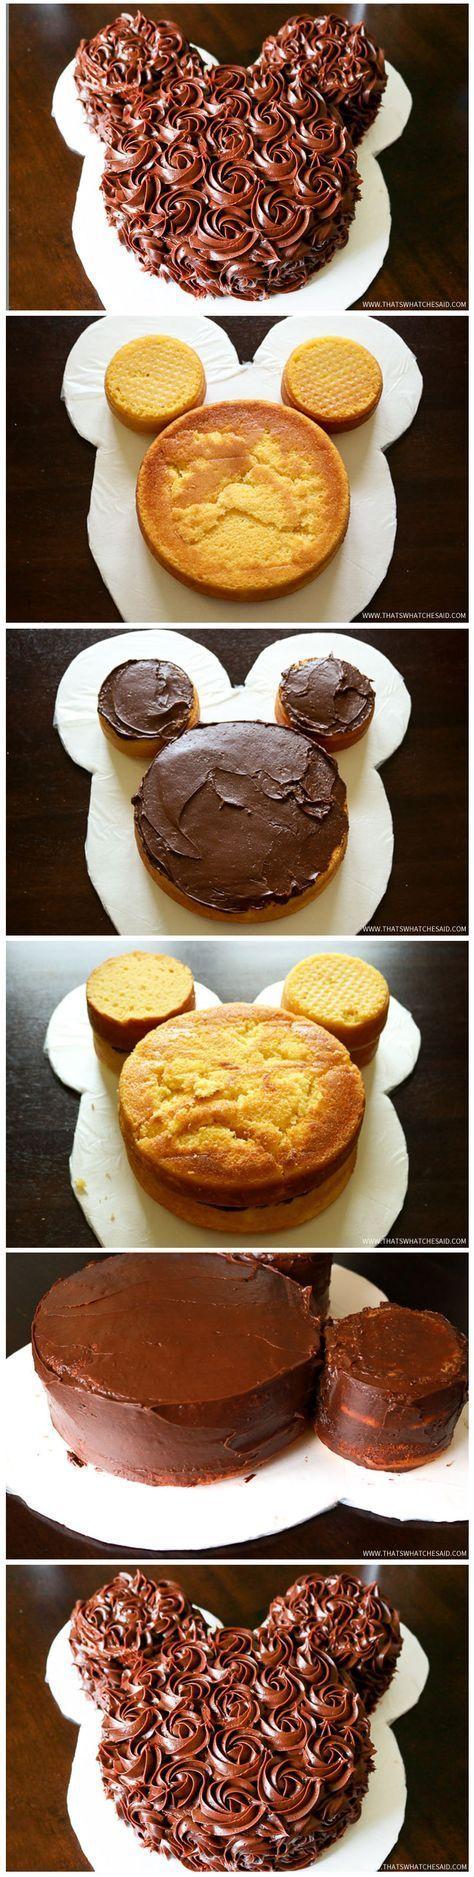 Rose Iced Mickey Mouse Cake More cake decorating recipes kuchen kindergeburtstag cakes ideas Food Cakes, Cupcake Cakes, Cupcakes Kids, Pastel Mickey, Cake Recipes, Dessert Recipes, Mickey Mouse Cake, Minnie Cake, Rose Cake